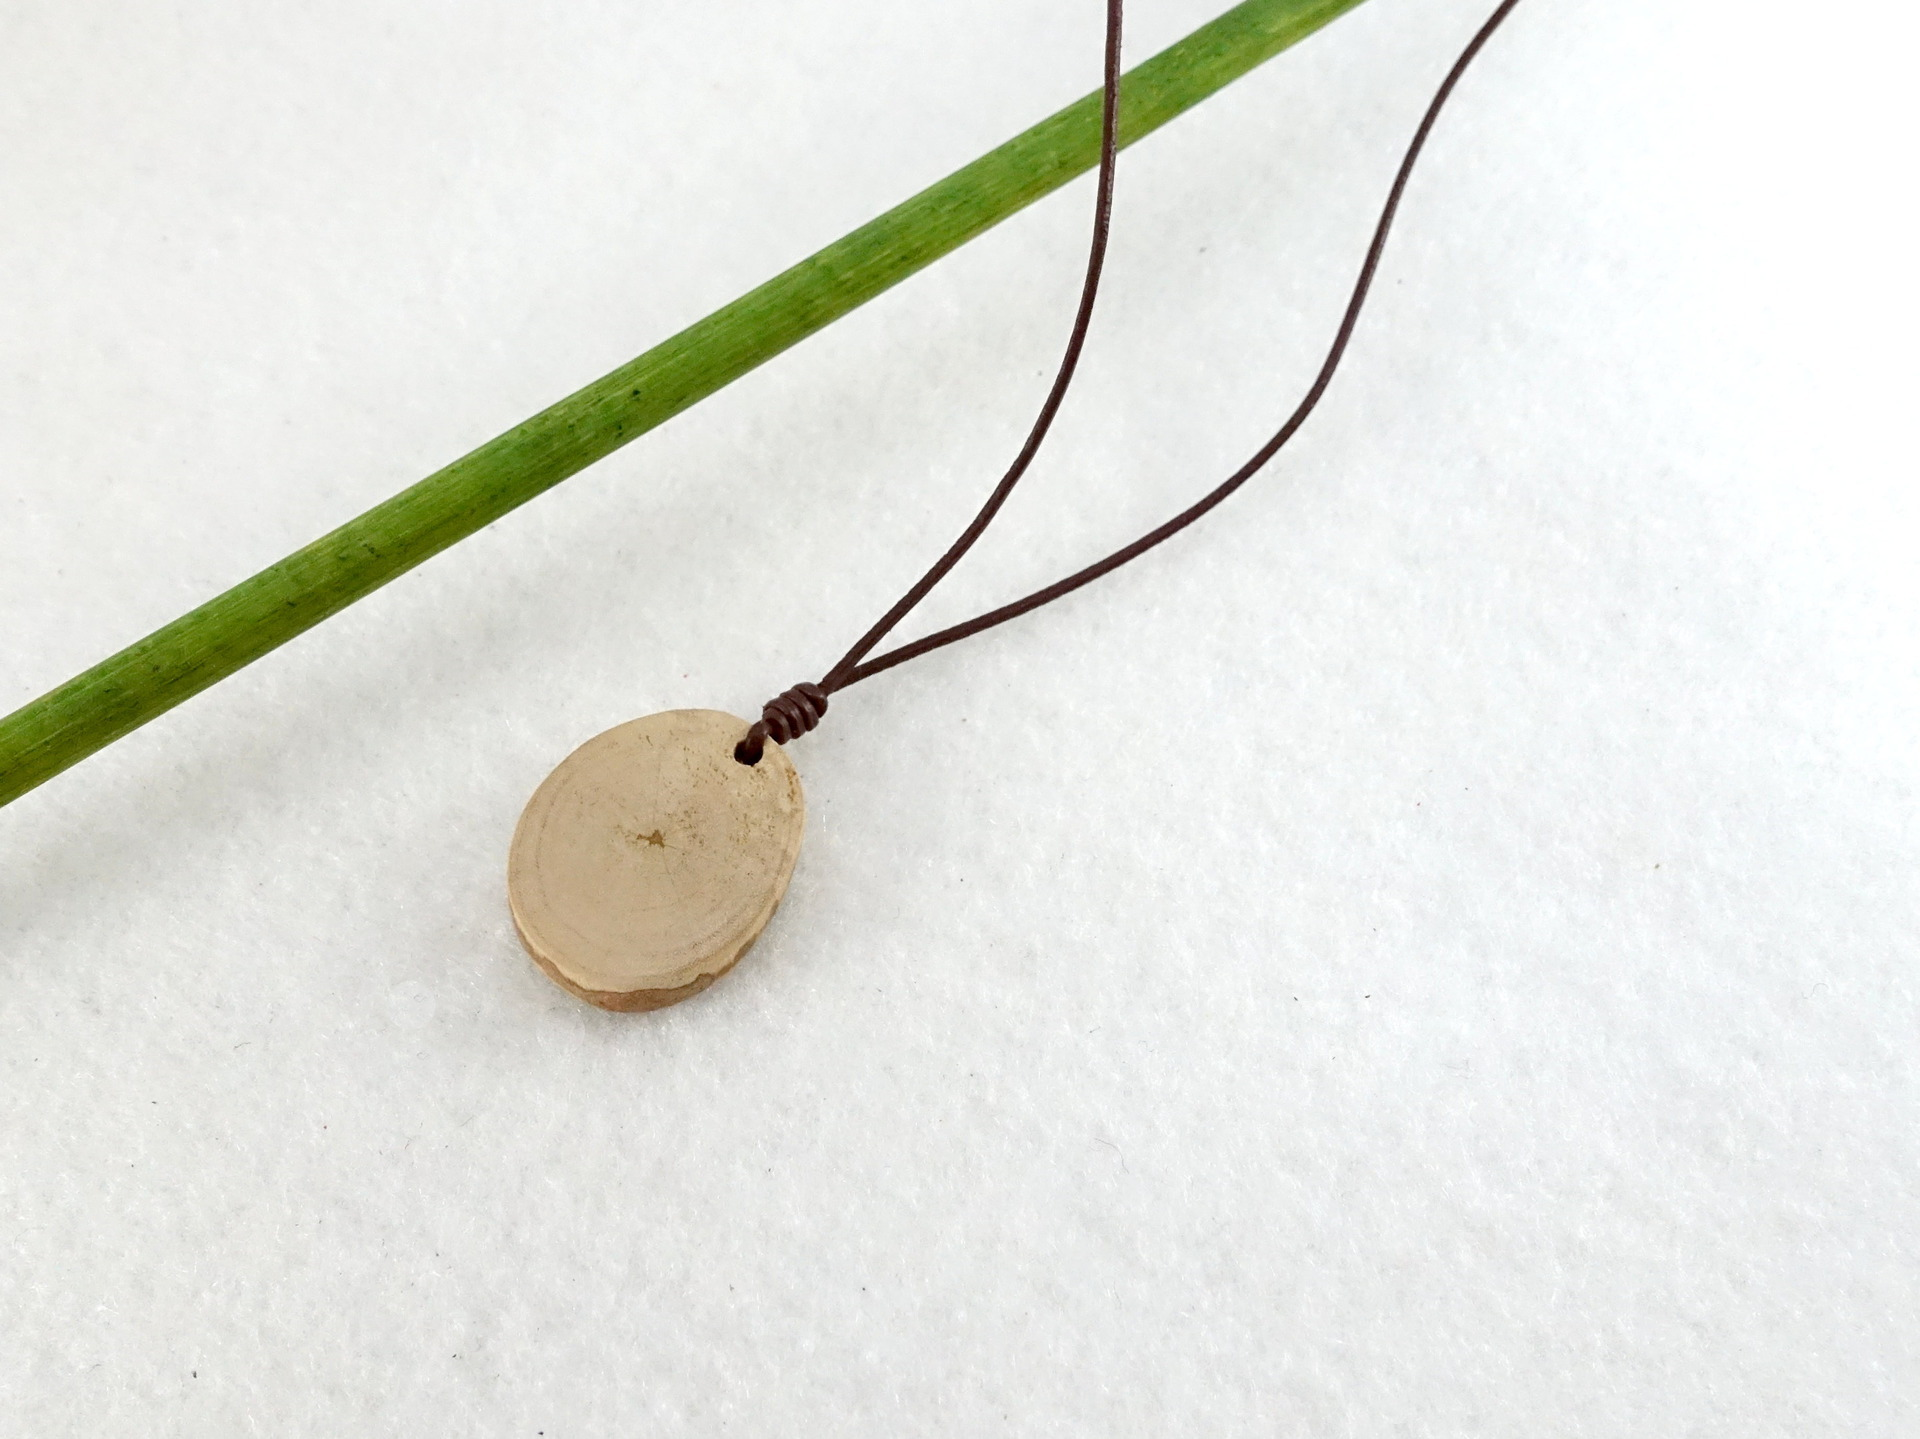 pendentif-pendentif-en-bois-collier-simple-e-18821910-collier-petite-3380-ee5b2_big